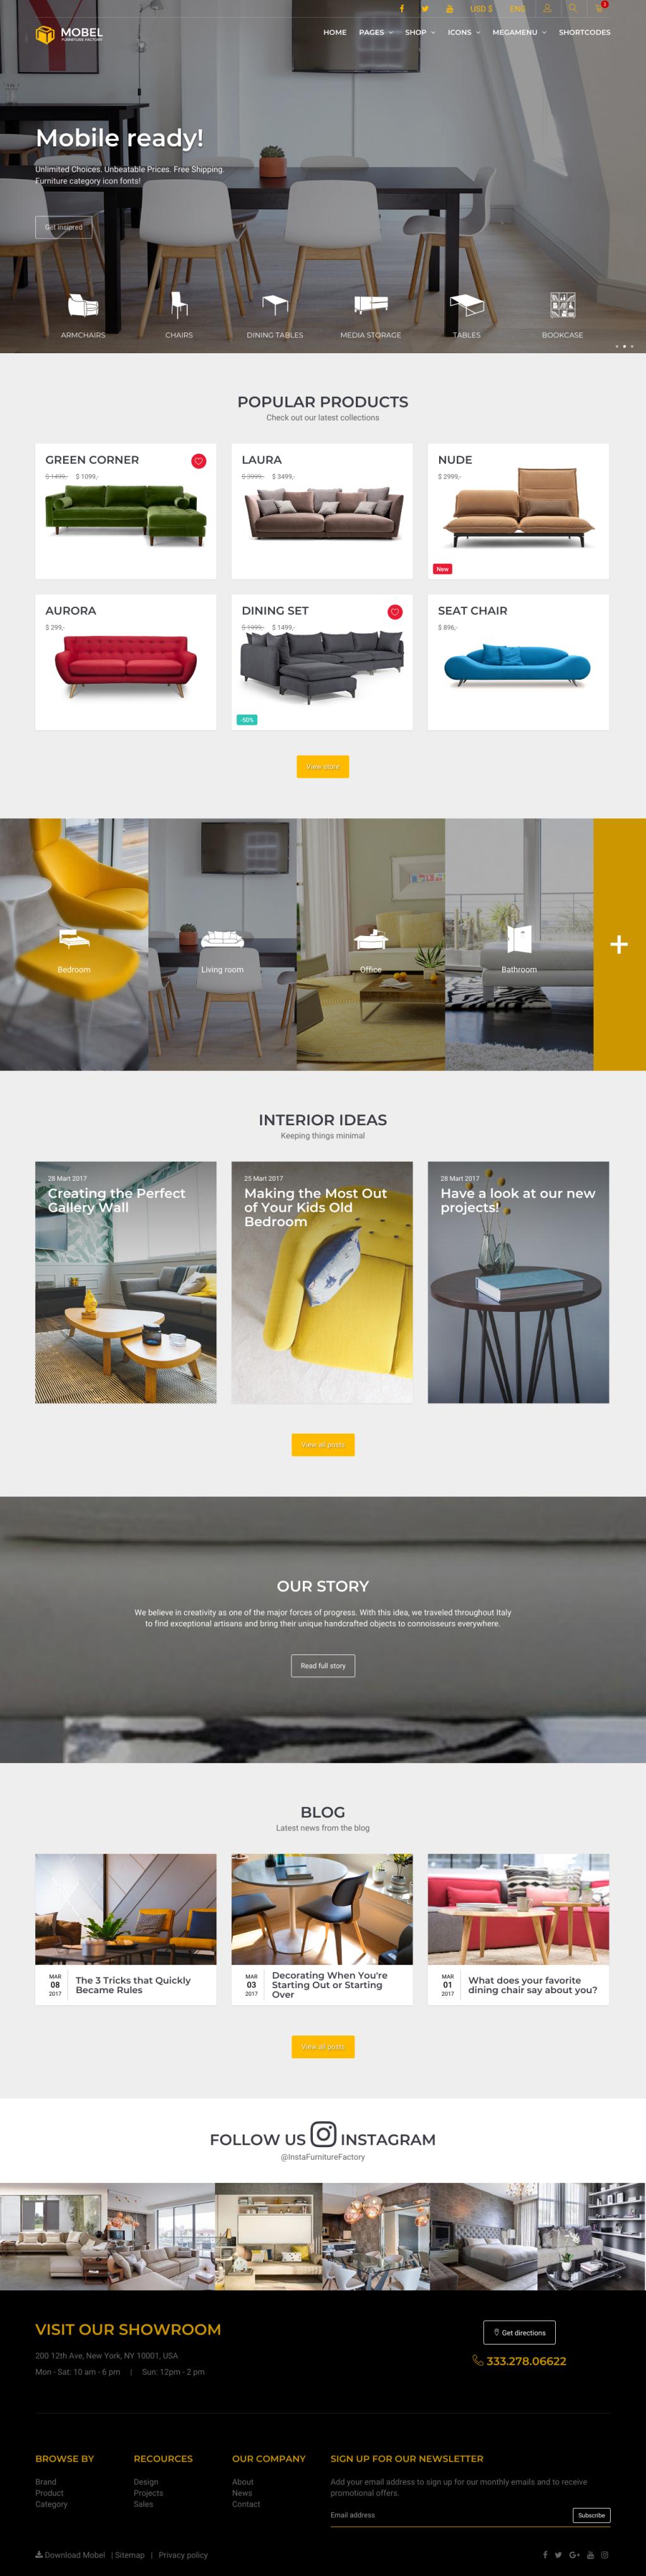 mobel furniture html website template creative decor decoration design exterior factory furniture home house interior modern portfolio shop